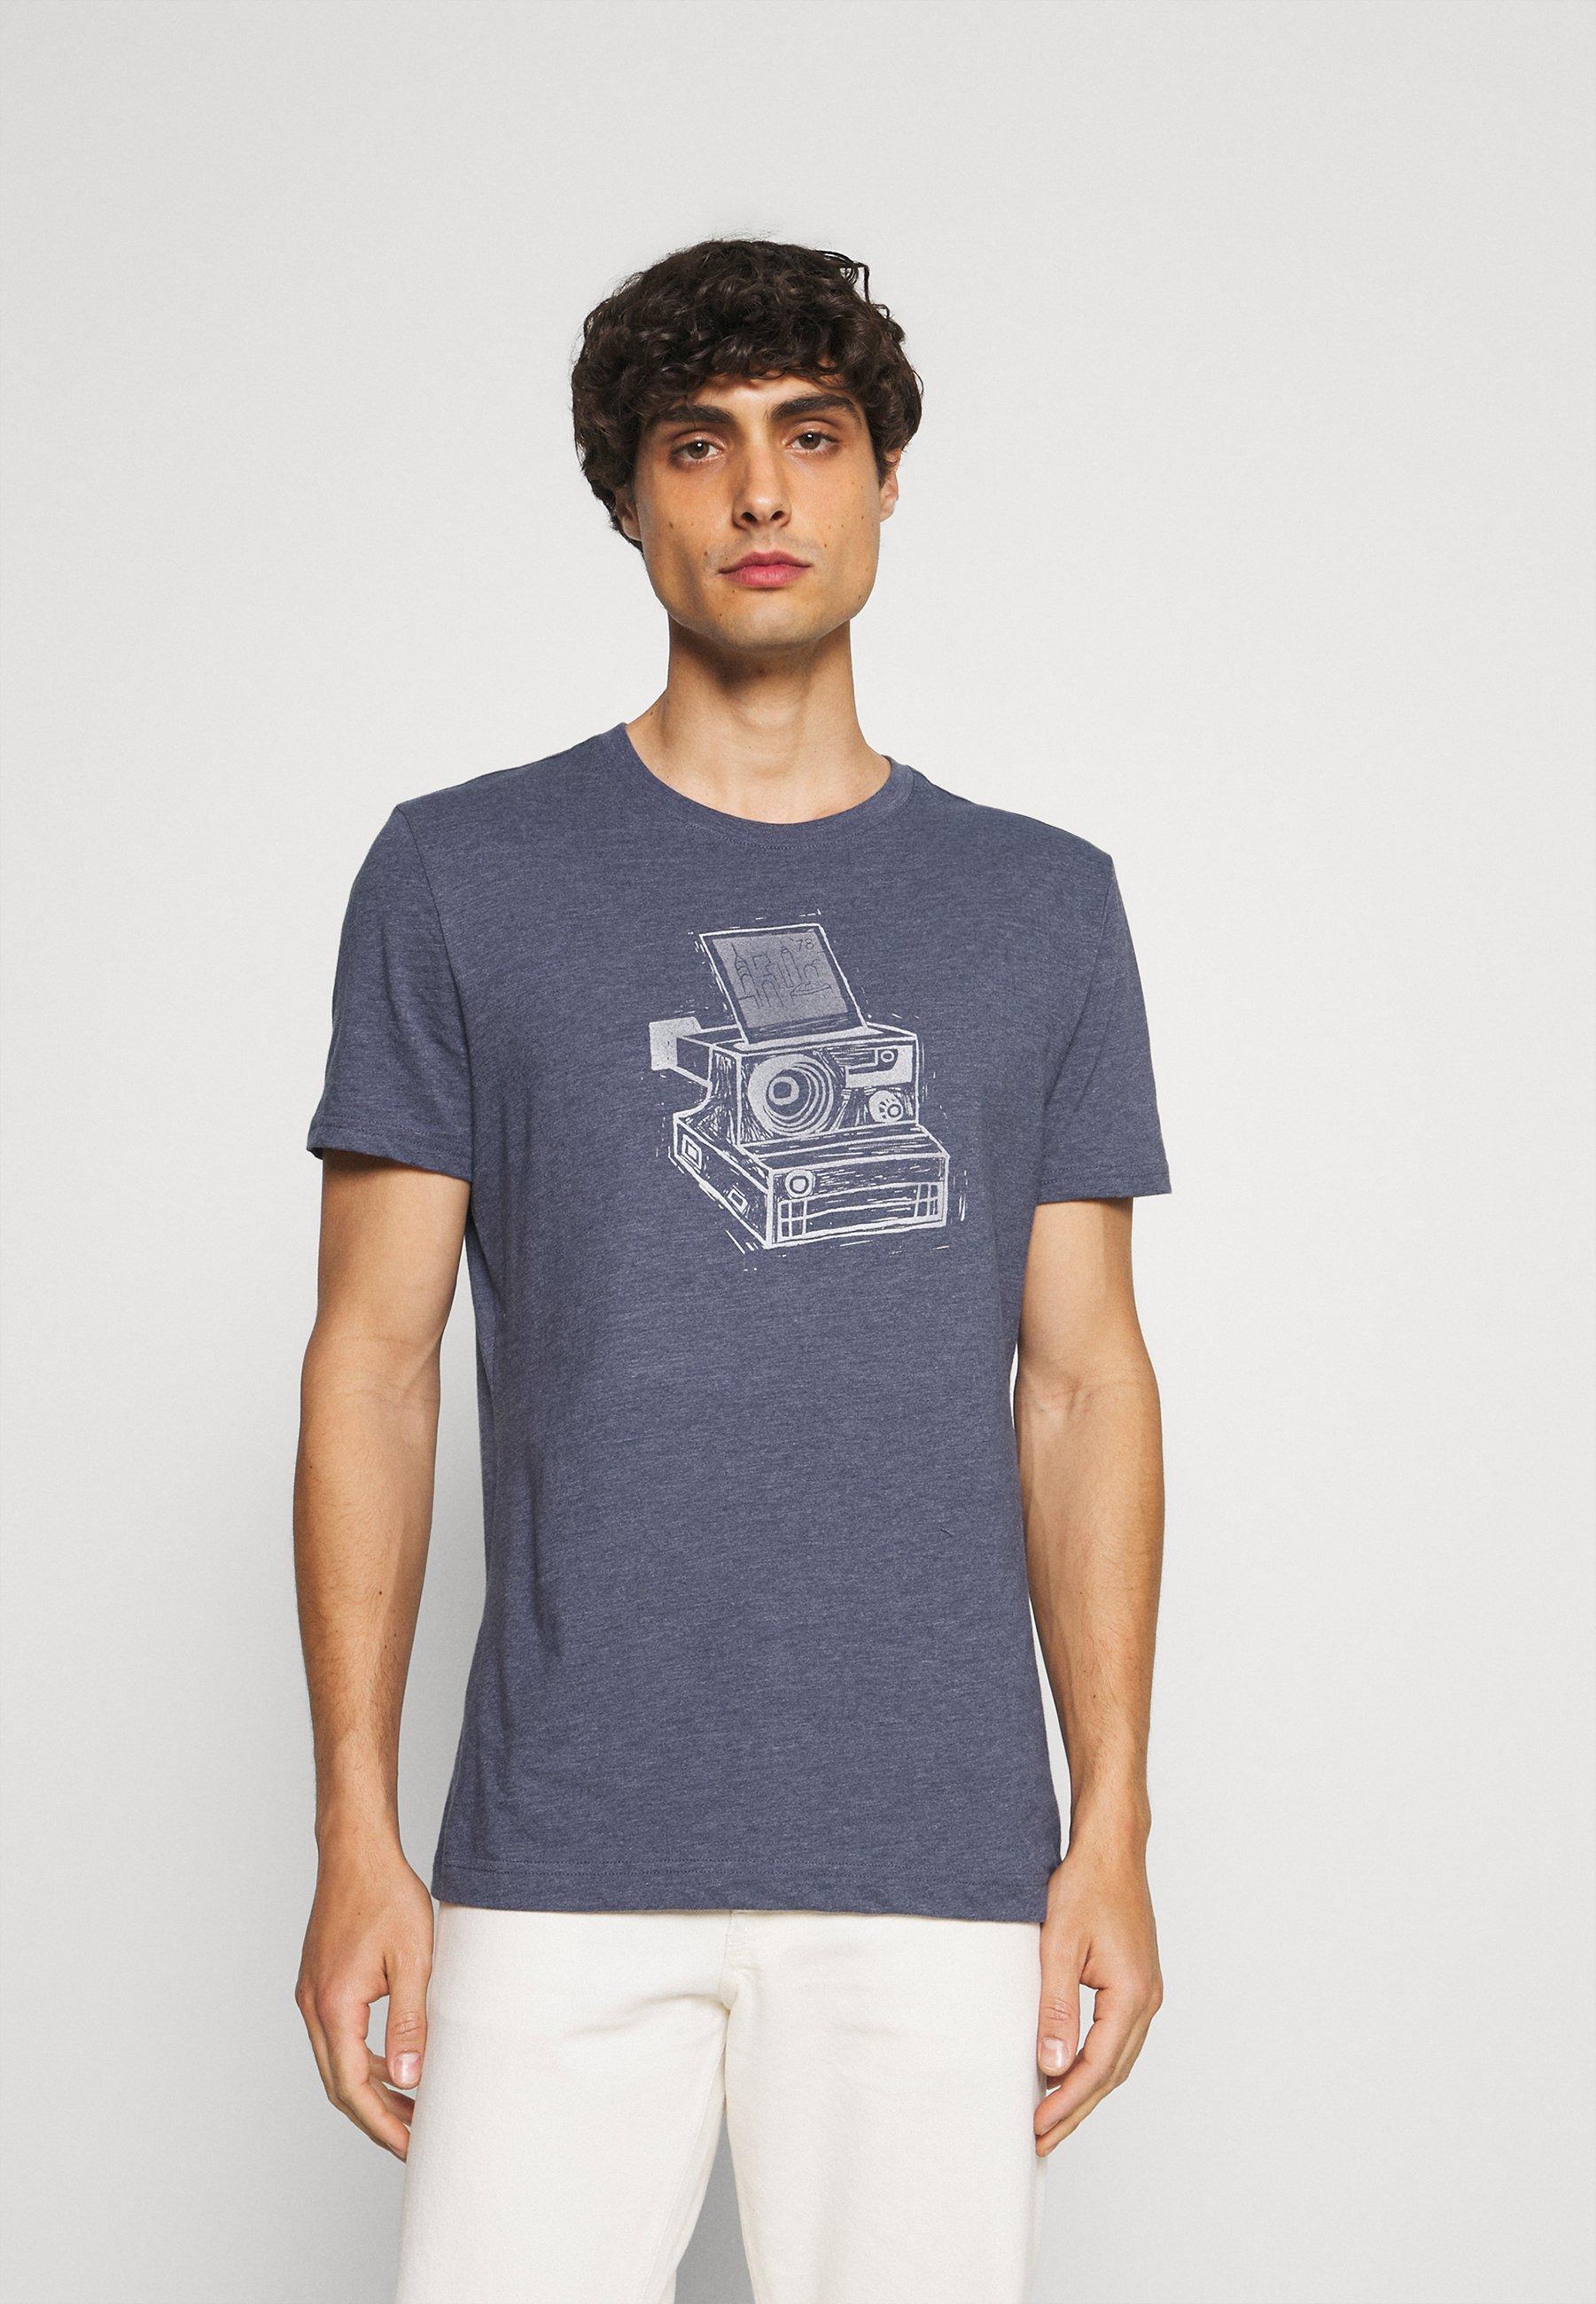 Homme INSTANT CAMERA - ECO GRAPHIC TEE - T-shirt imprimé